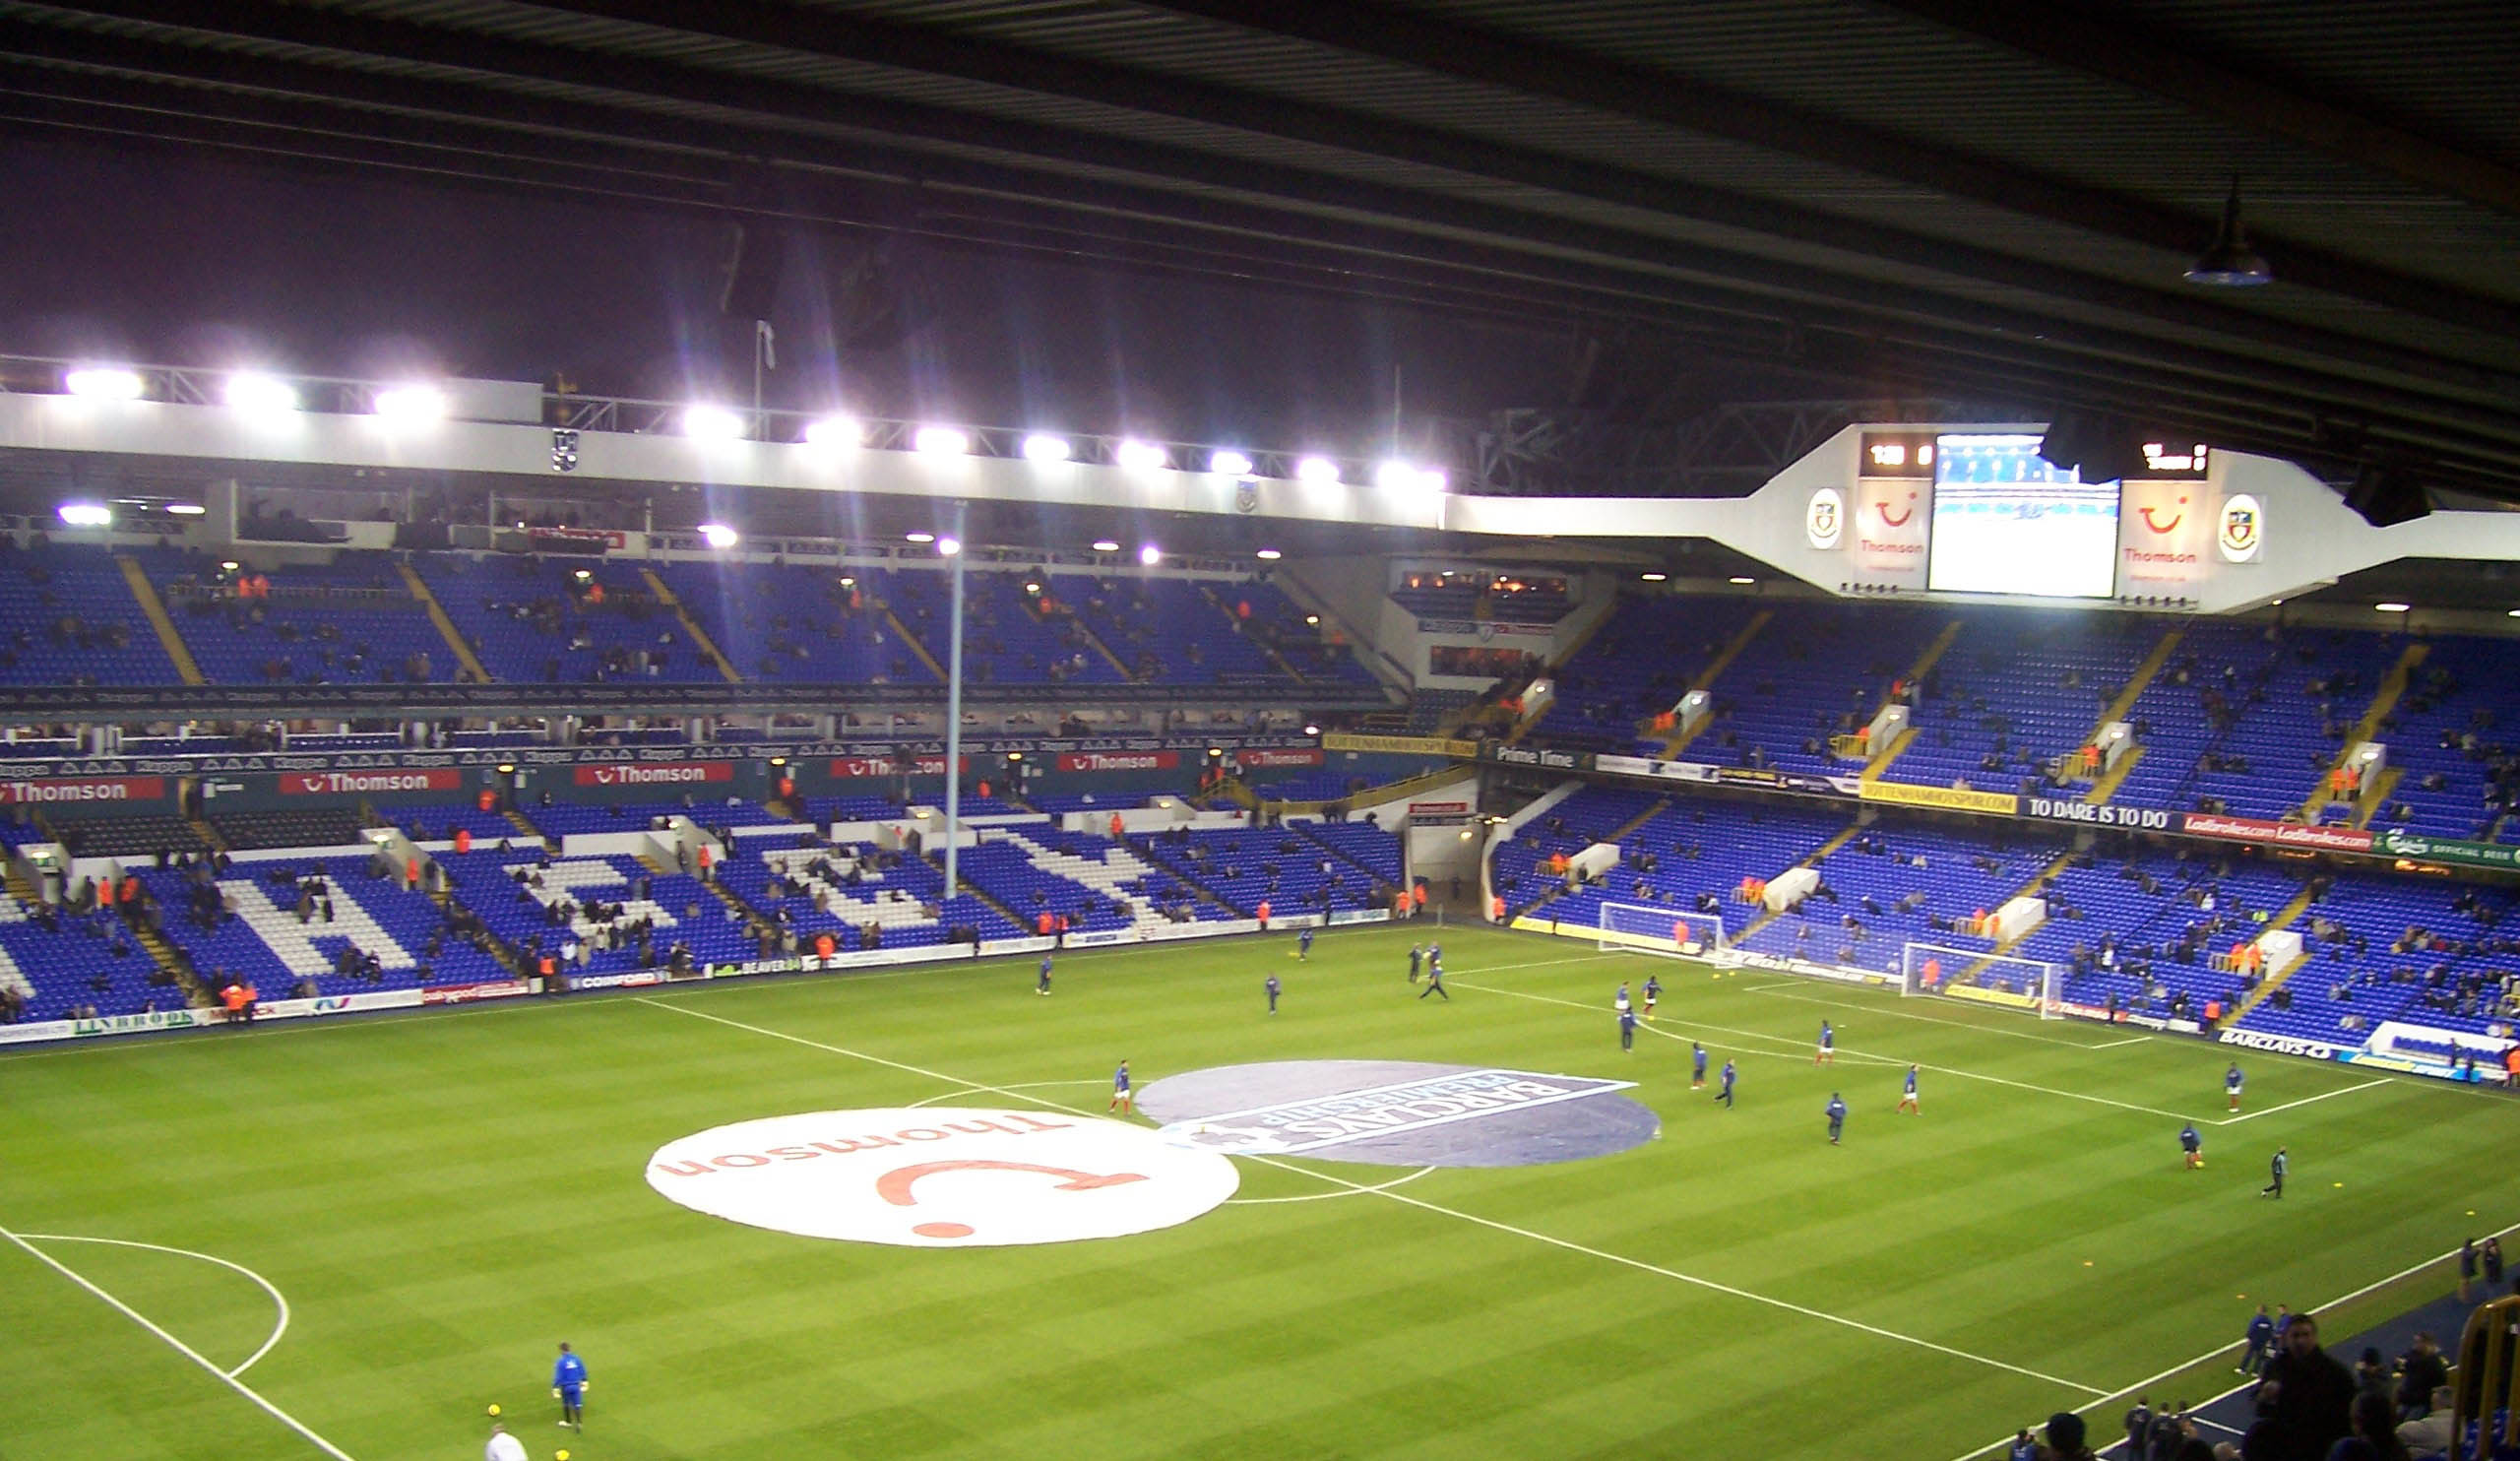 Tottenham Hotspur launches new 'Spurs Go' app